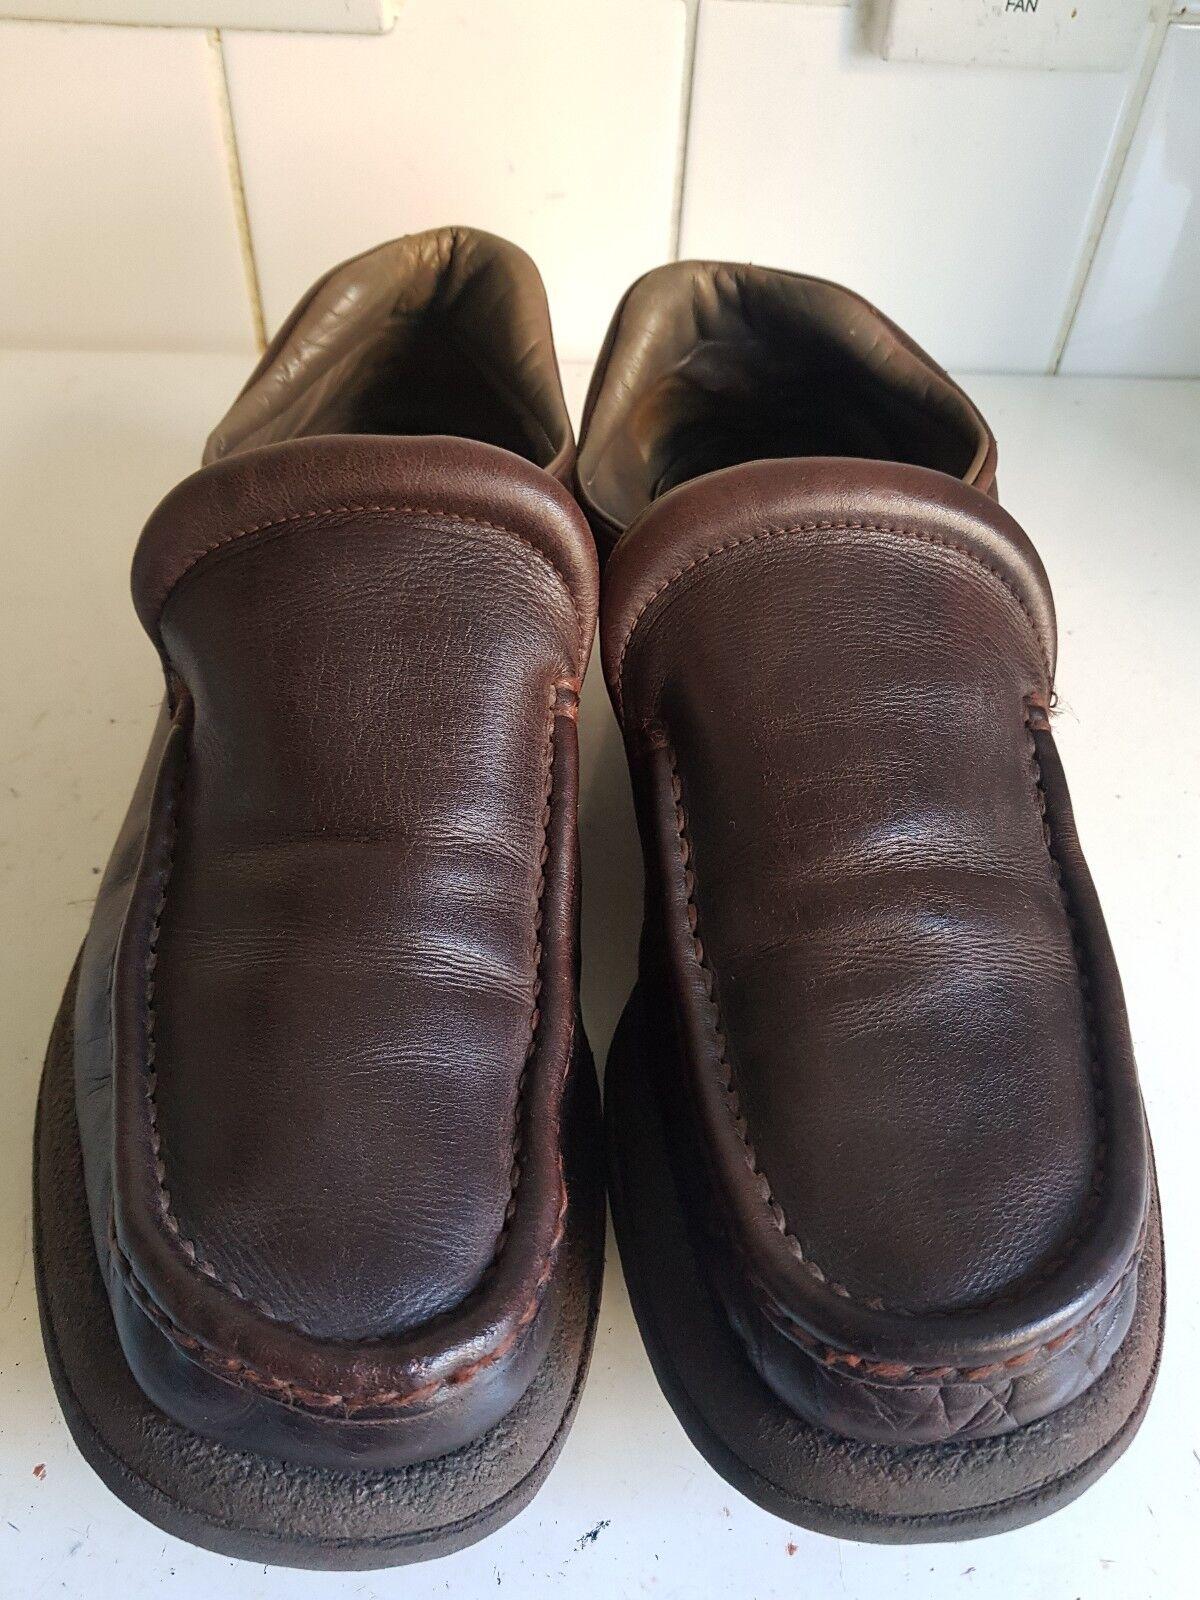 PAUL SMITH DESIGNER  Herren Schuhe LEATHER BROWN MOCCASINS LOAFERS Schuhe Herren SIZE UK 9 EU 43 5a162d